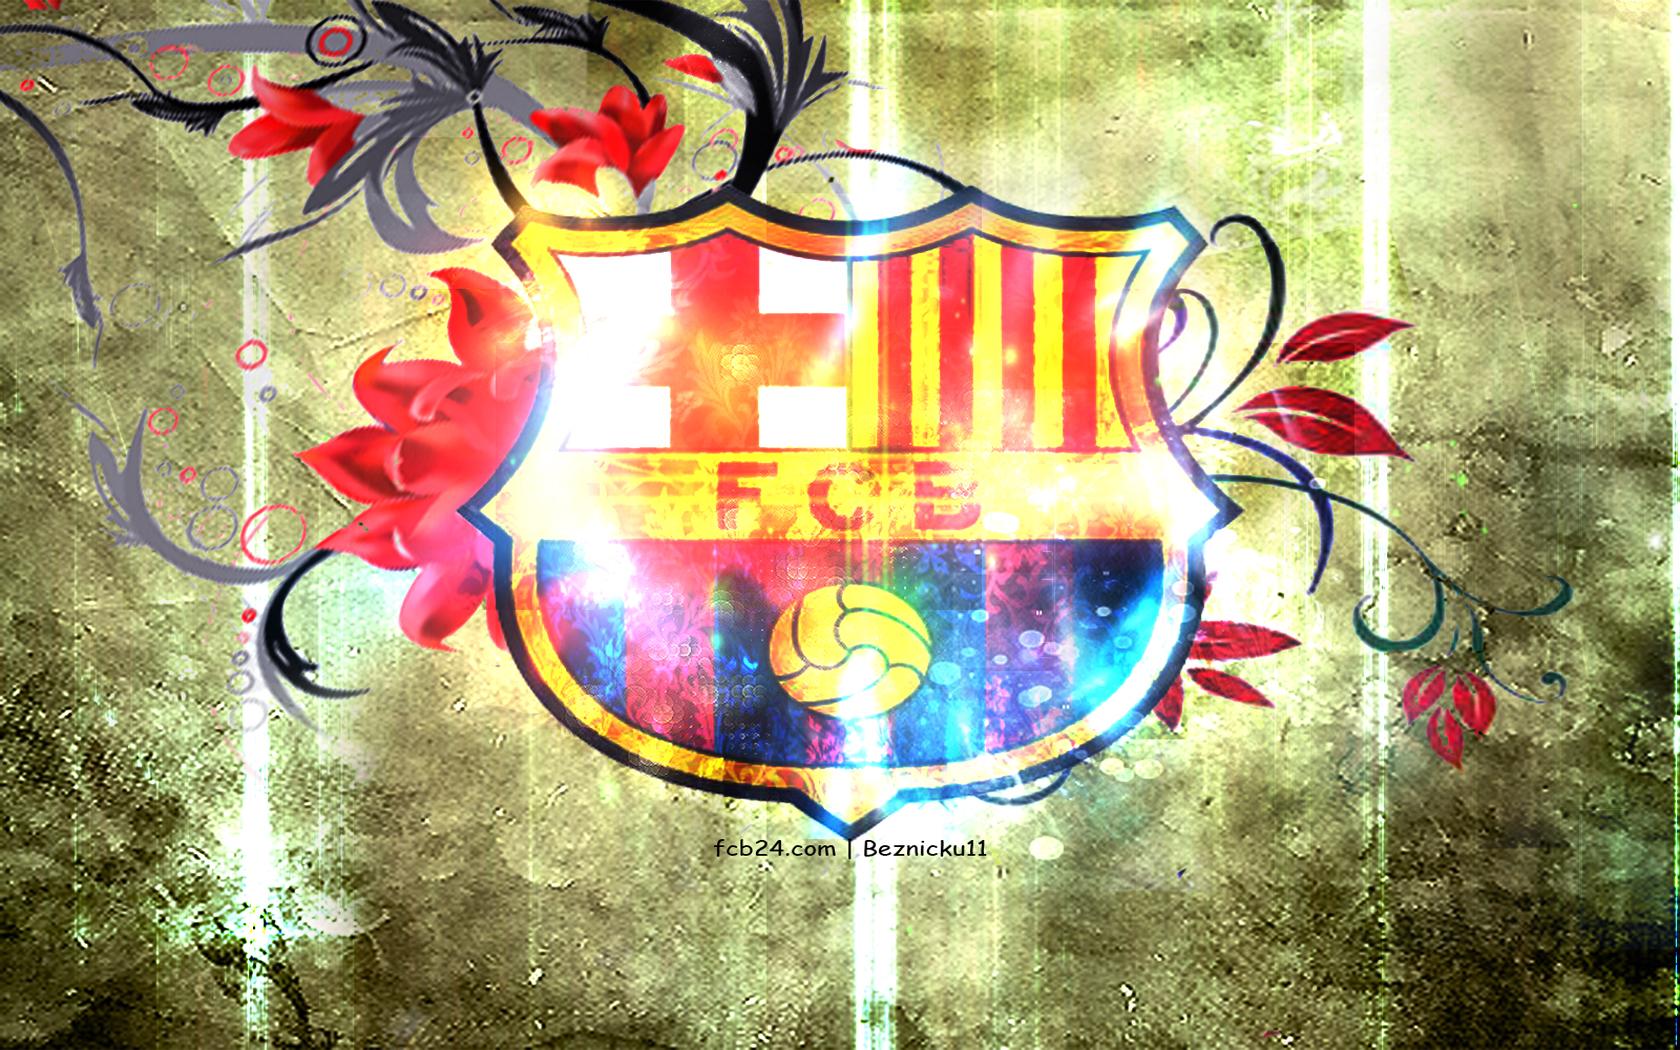 34e9ea3e6 FC Barcelona 1680x1050 011 herb - Tapety na pulpit